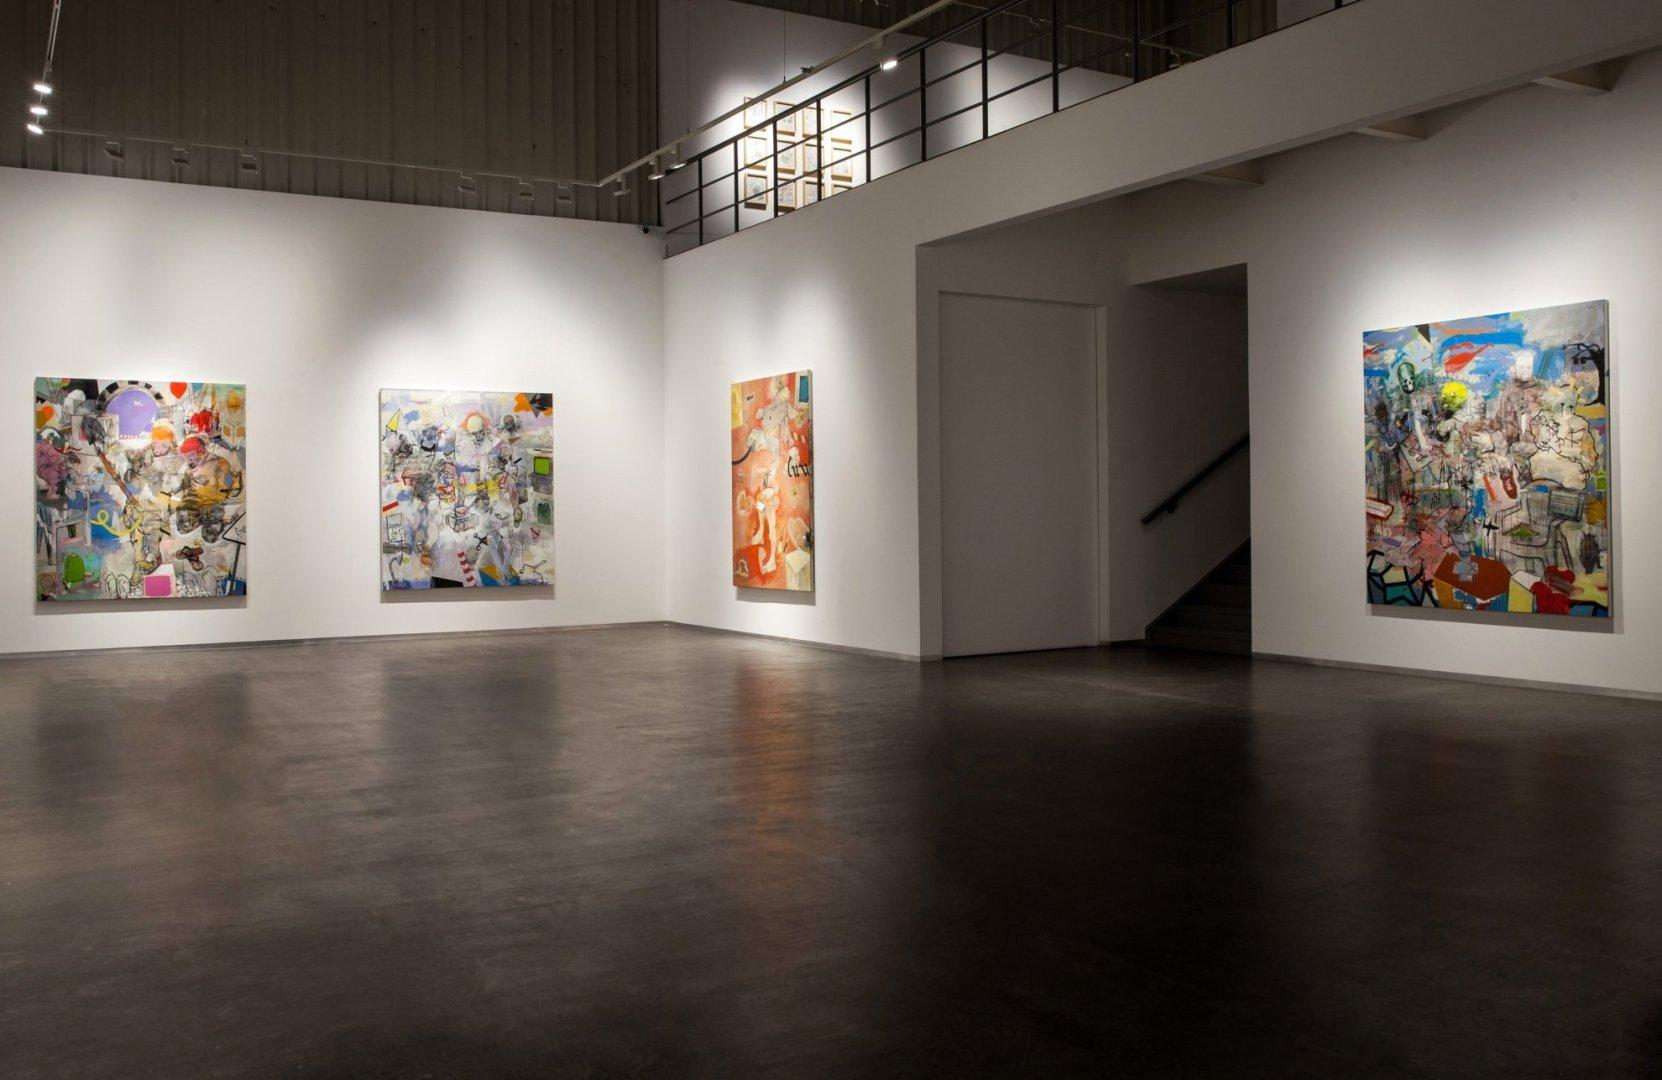 The Best Contemporary Art Galleries in Dubai